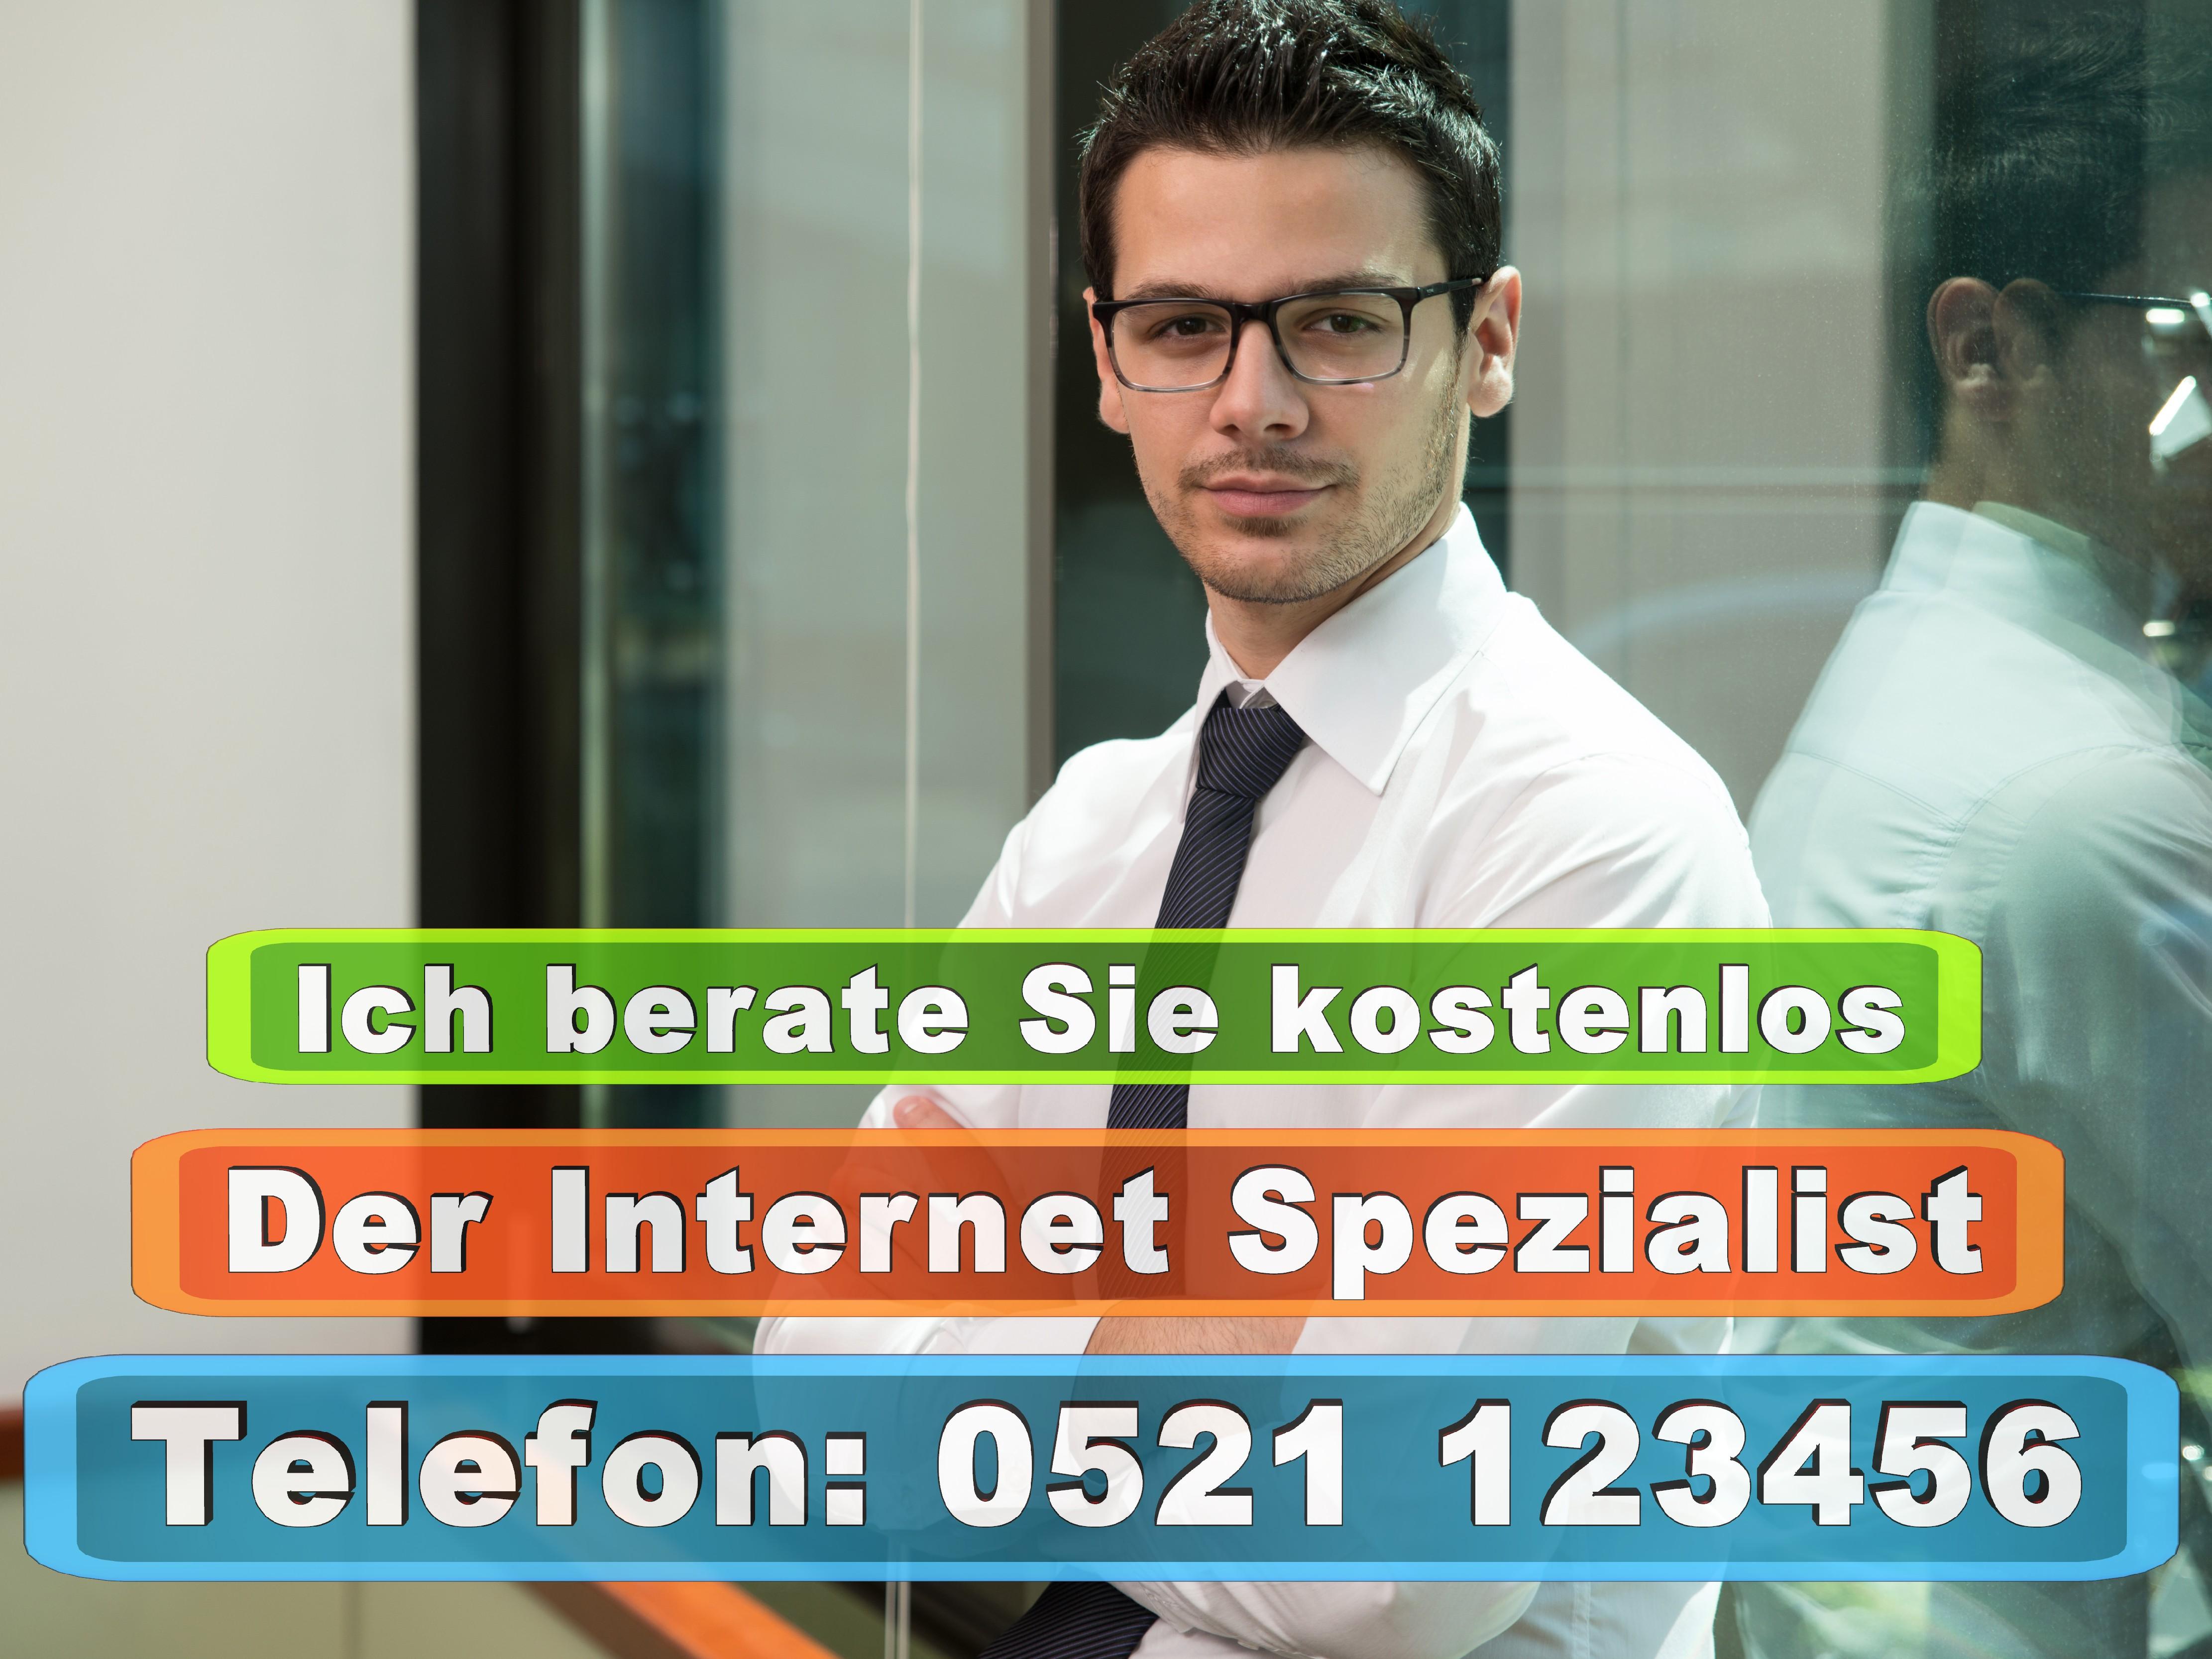 Rechtsanwalt In Bielefeld Steuerberater NRW OWL Paderborn Münster Dortmund Berlin Hamburg Düsseldorf Köln (13)